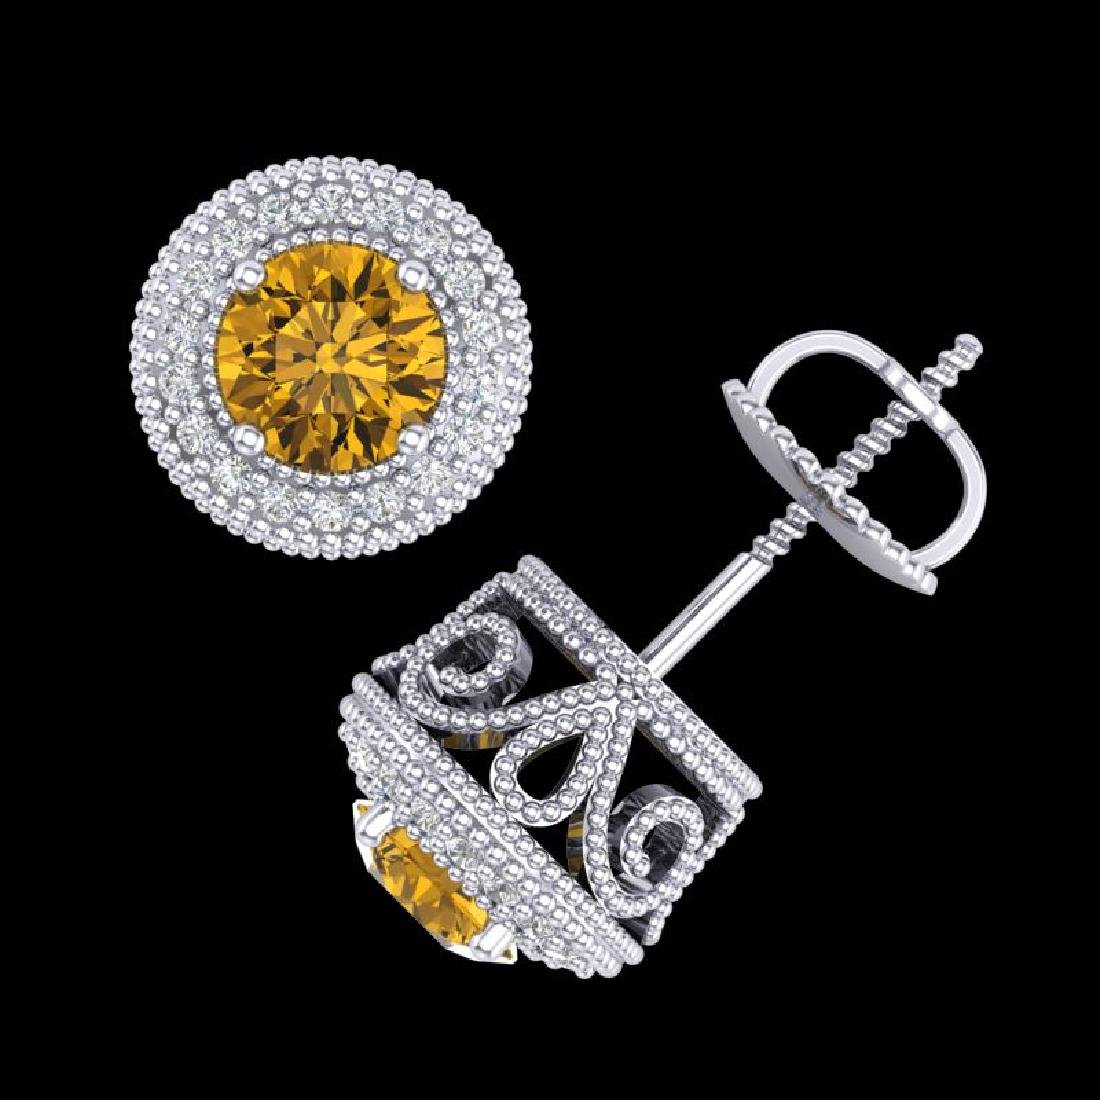 1.55 CTW Intense Fancy Yellow Diamond Art Deco Stud - 3